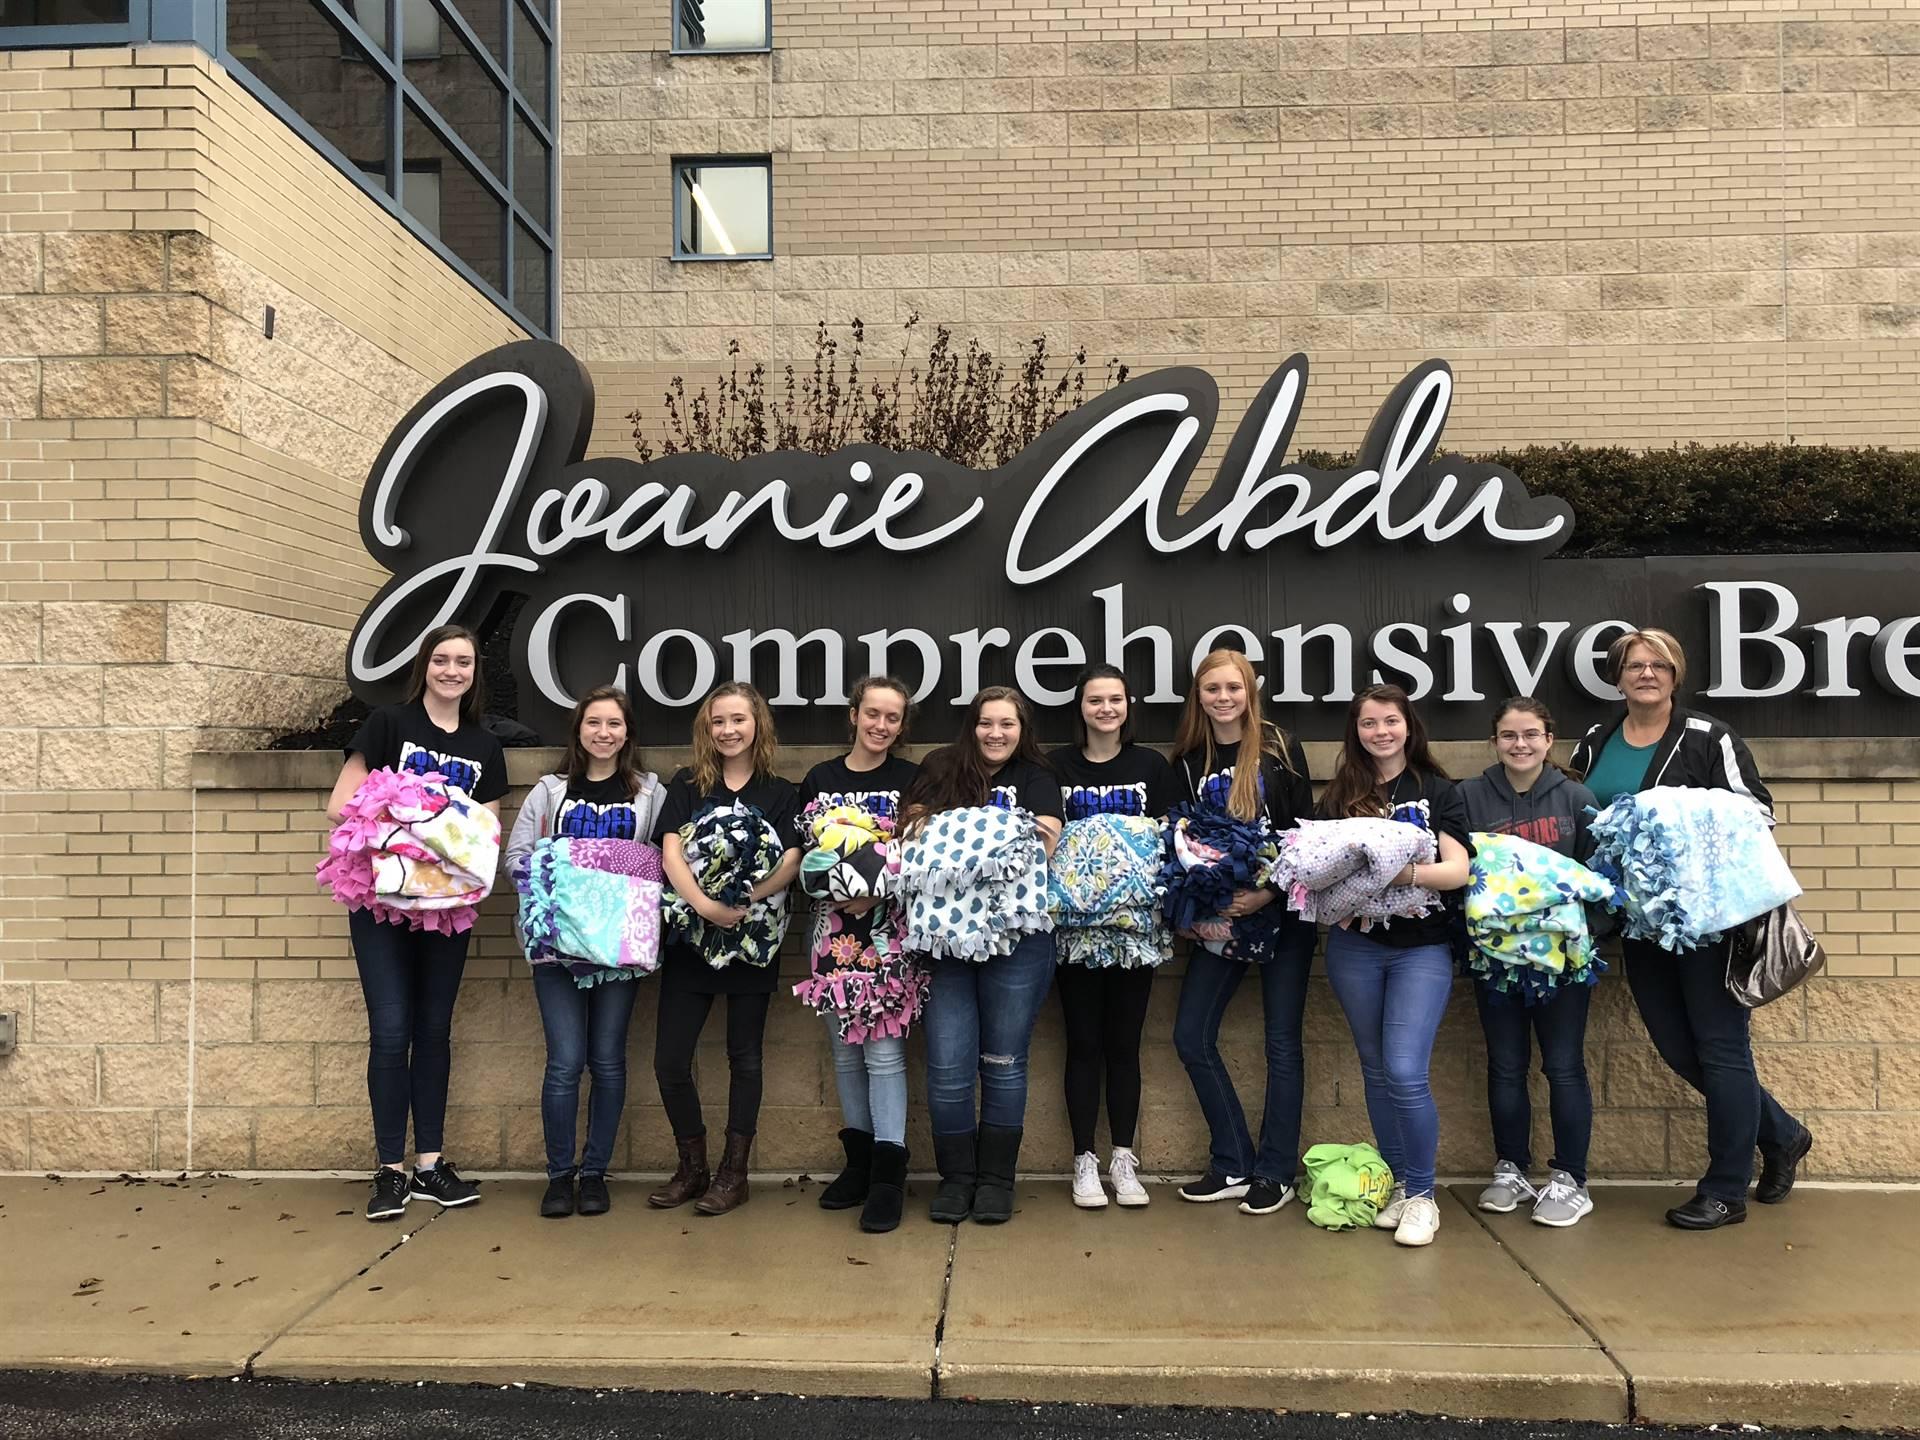 High school cheerleaders and Mrs. Denovchek delivering handmade blankets to cancer patients